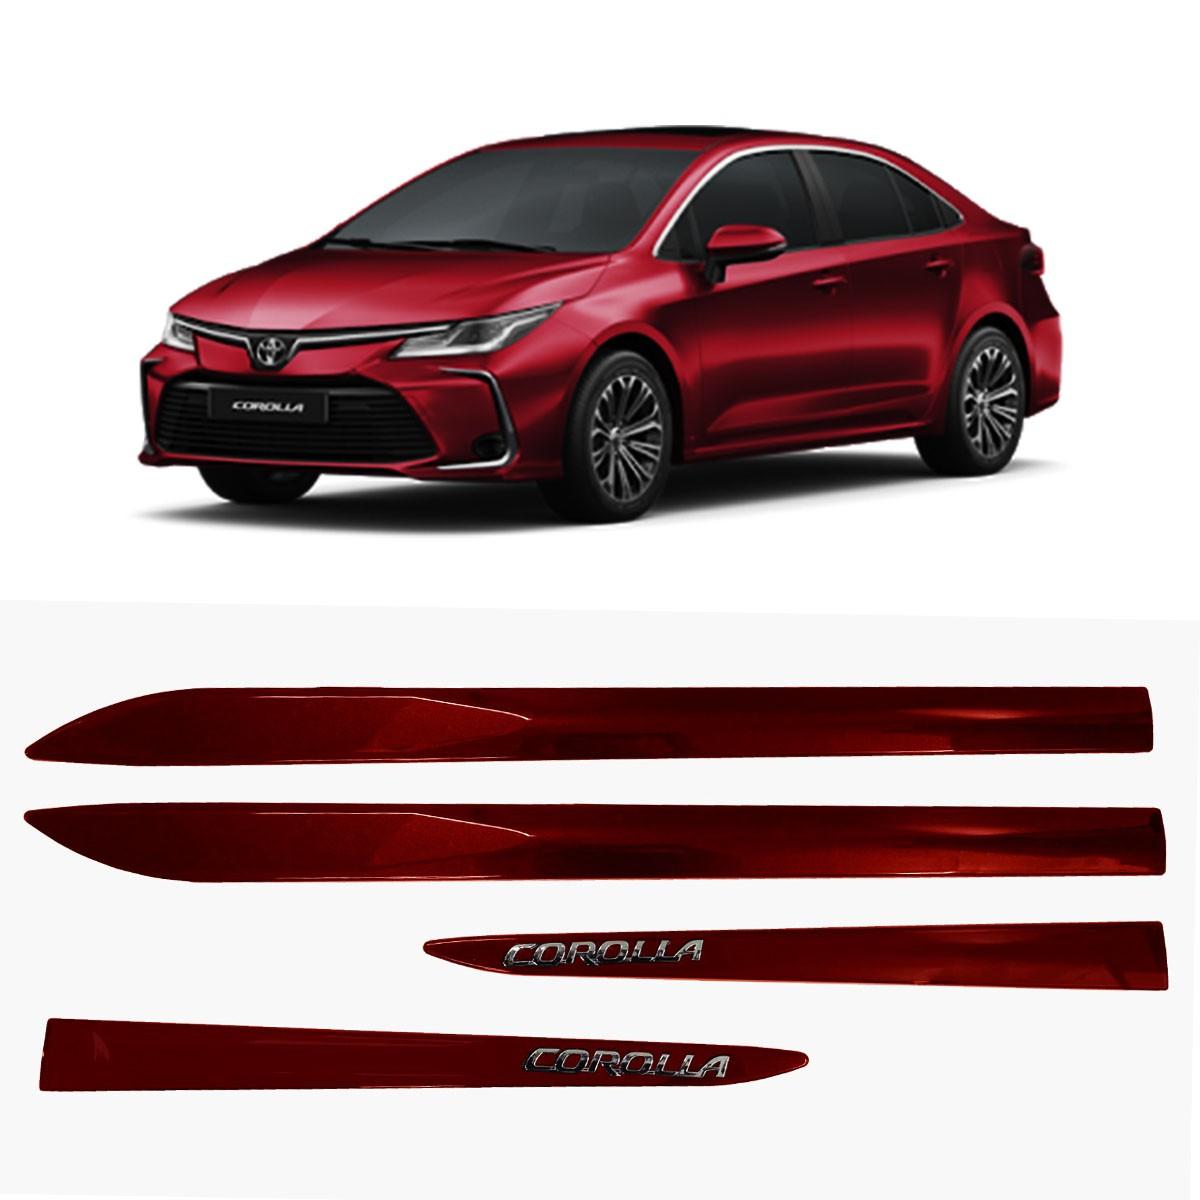 Friso Lateral Corolla Vermelho Granada C/Escrita Cromada Modelo 2020 Original